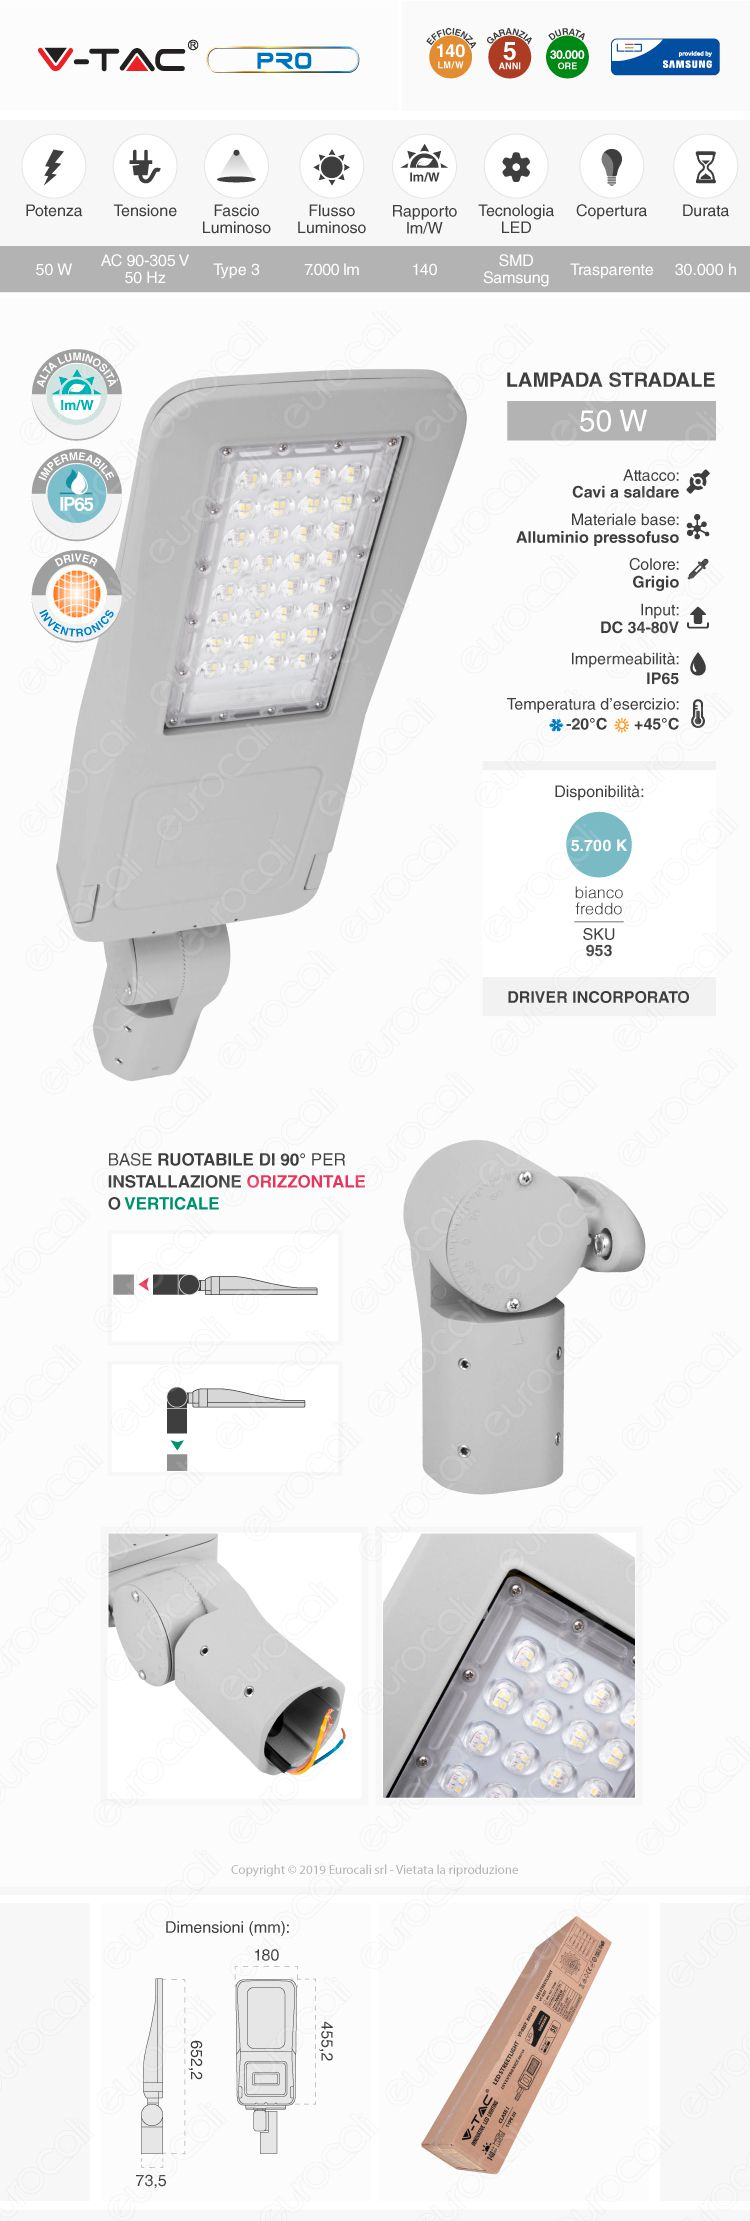 V-Tac PRO VT-53ST Lampada Stradale LED 50W Lampione SMD Chip Samsung Fascio Luminoso Type 3